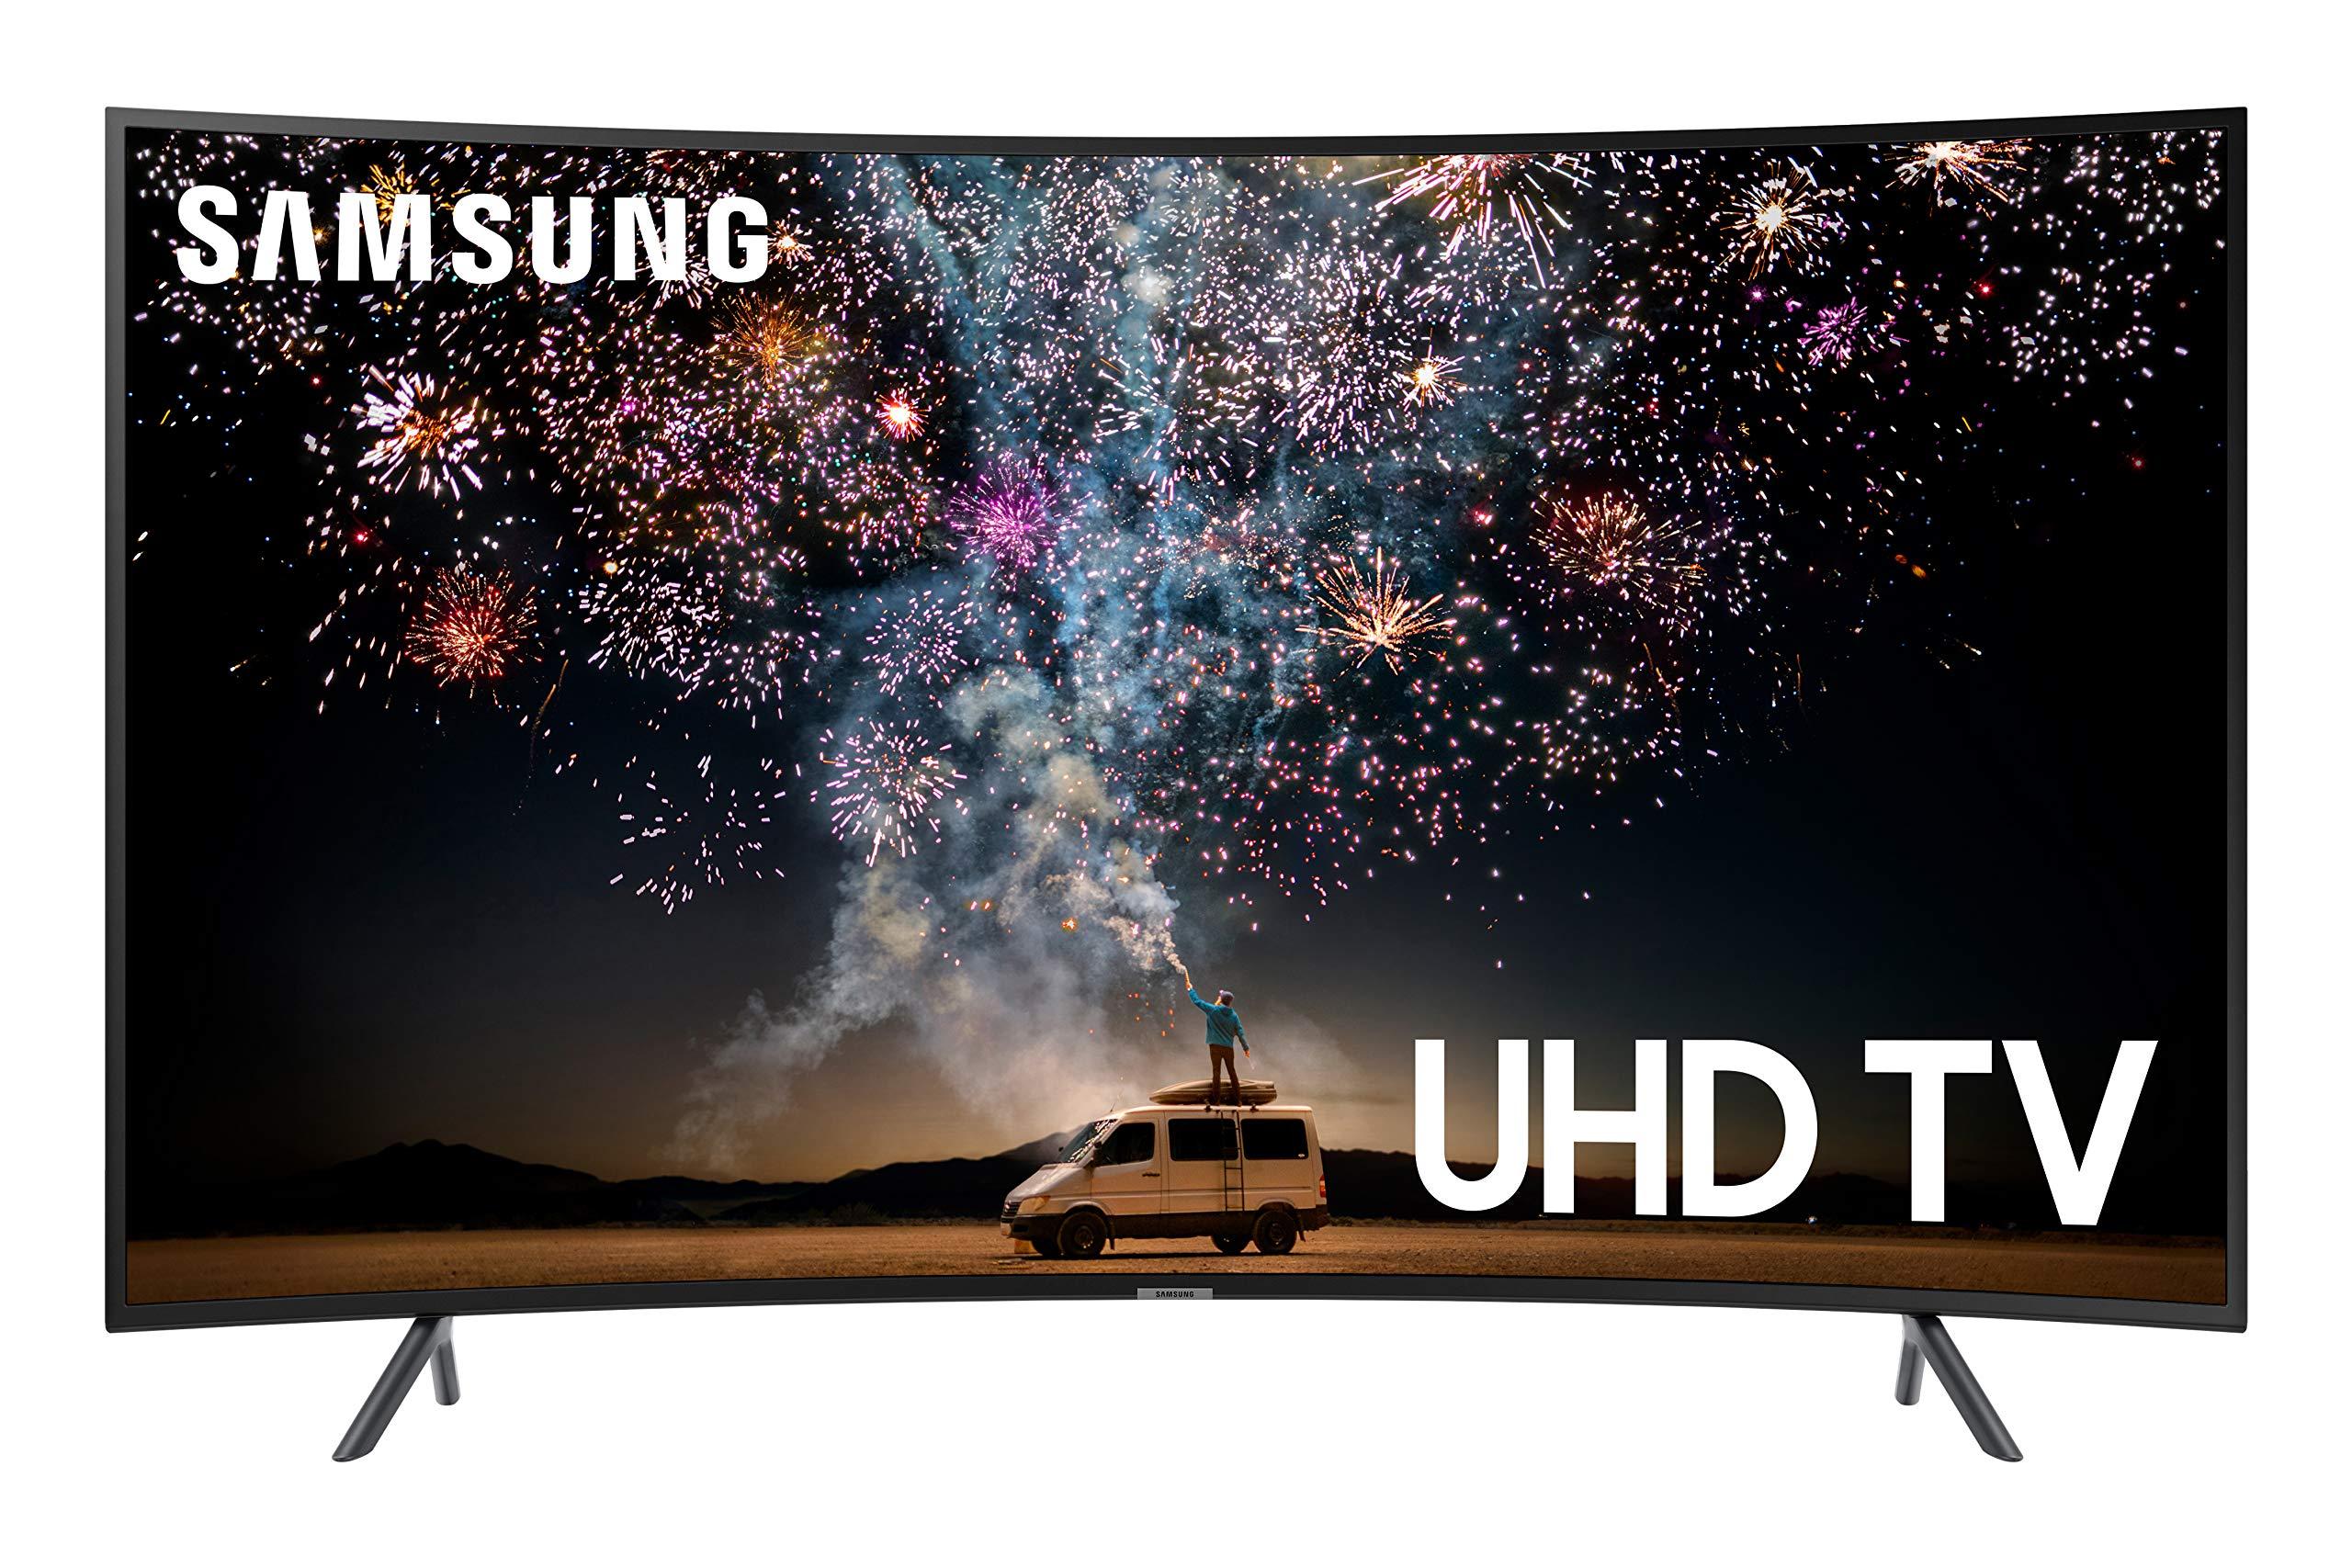 Samsung UN55RU7300FXZA CURVED 55'' 4K UHD 7 Series Smart TV (2019) by Samsung